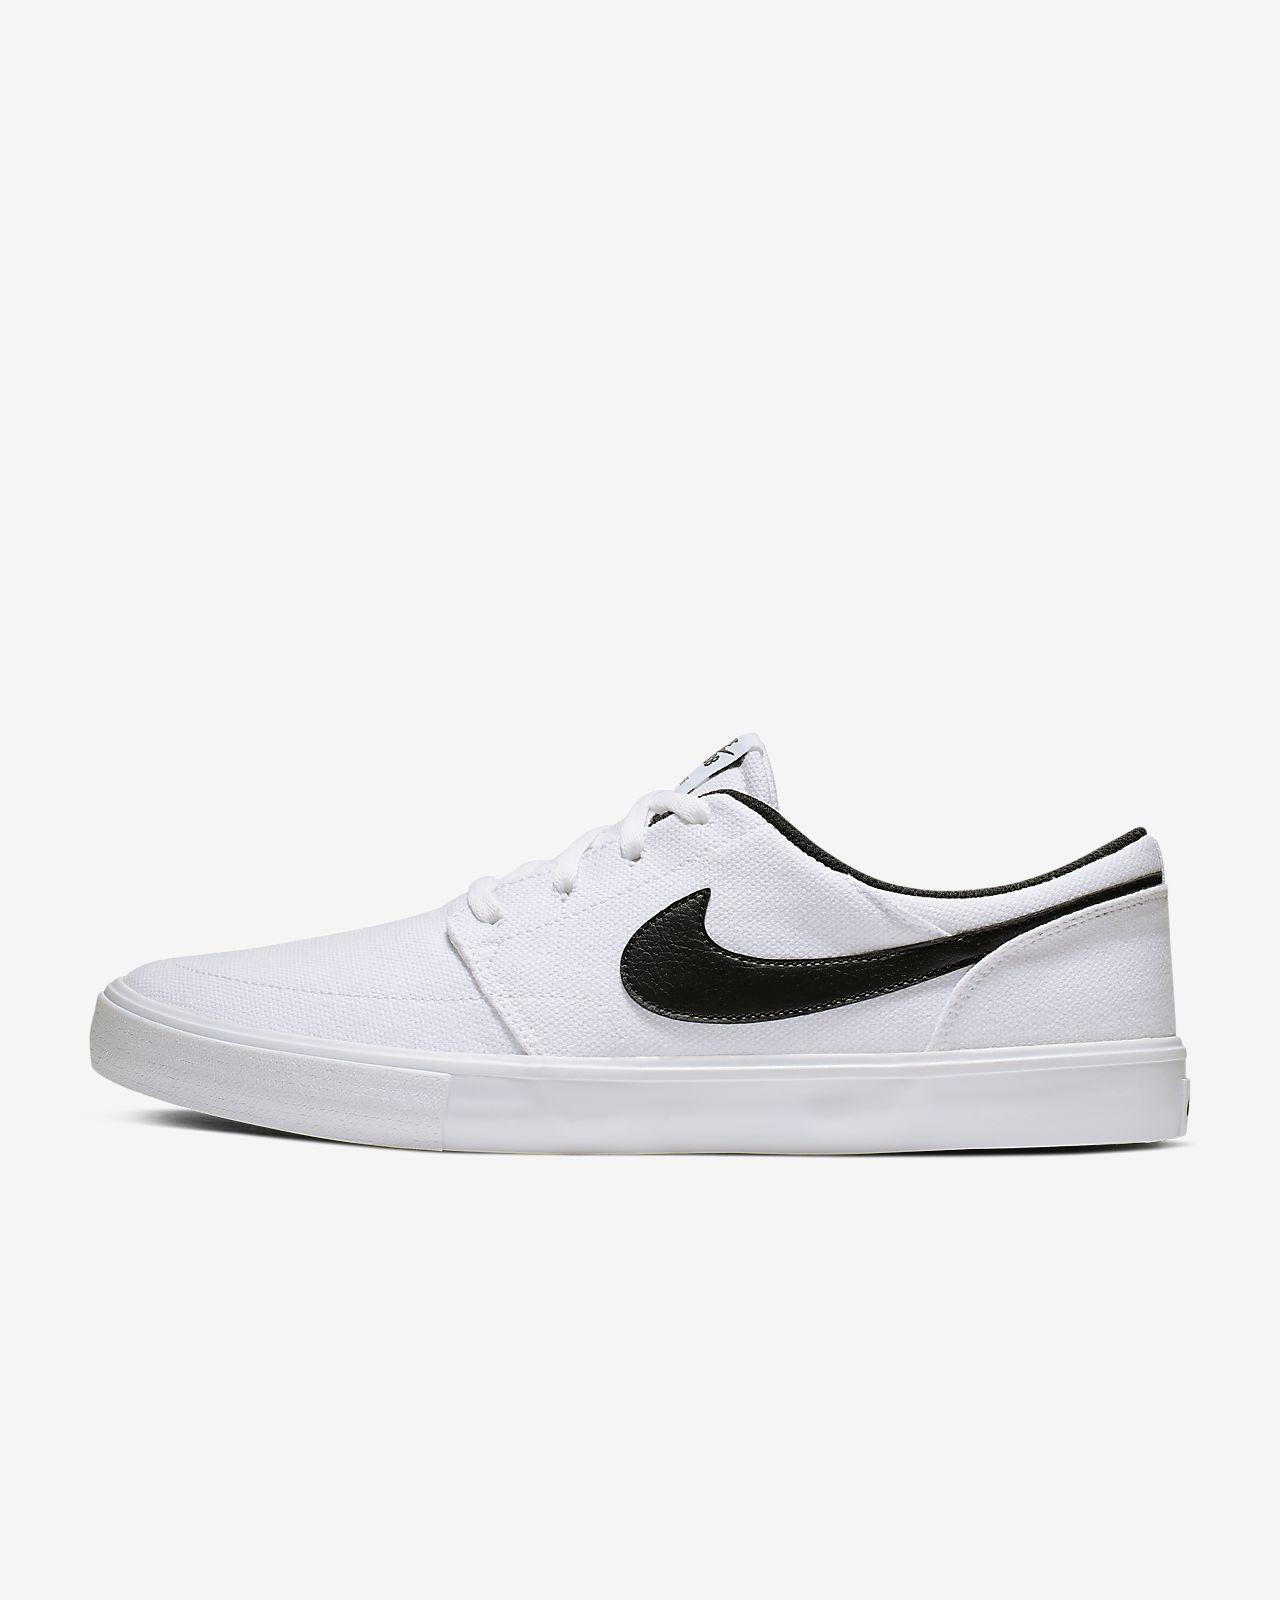 Buty do skateboardingu Nike SB Solarsoft Portmore 2